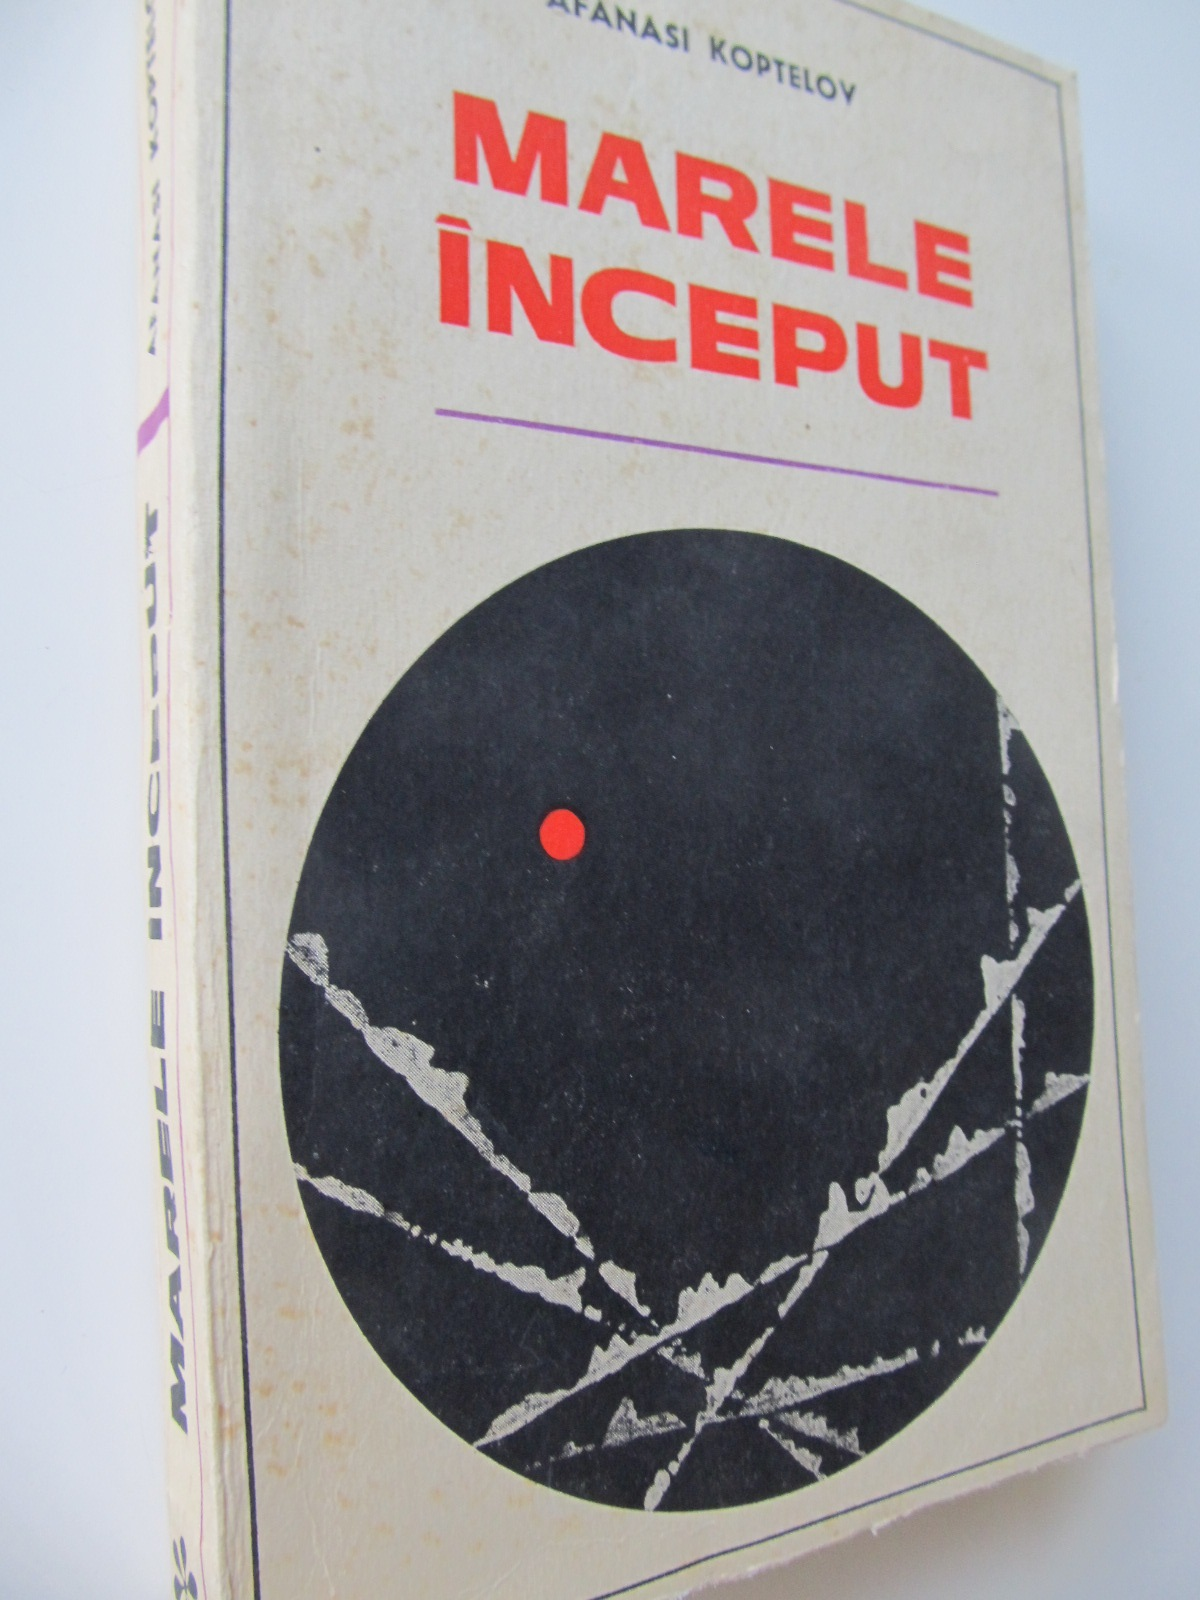 Marele inceput - Afanasi Koptelov | Detalii carte